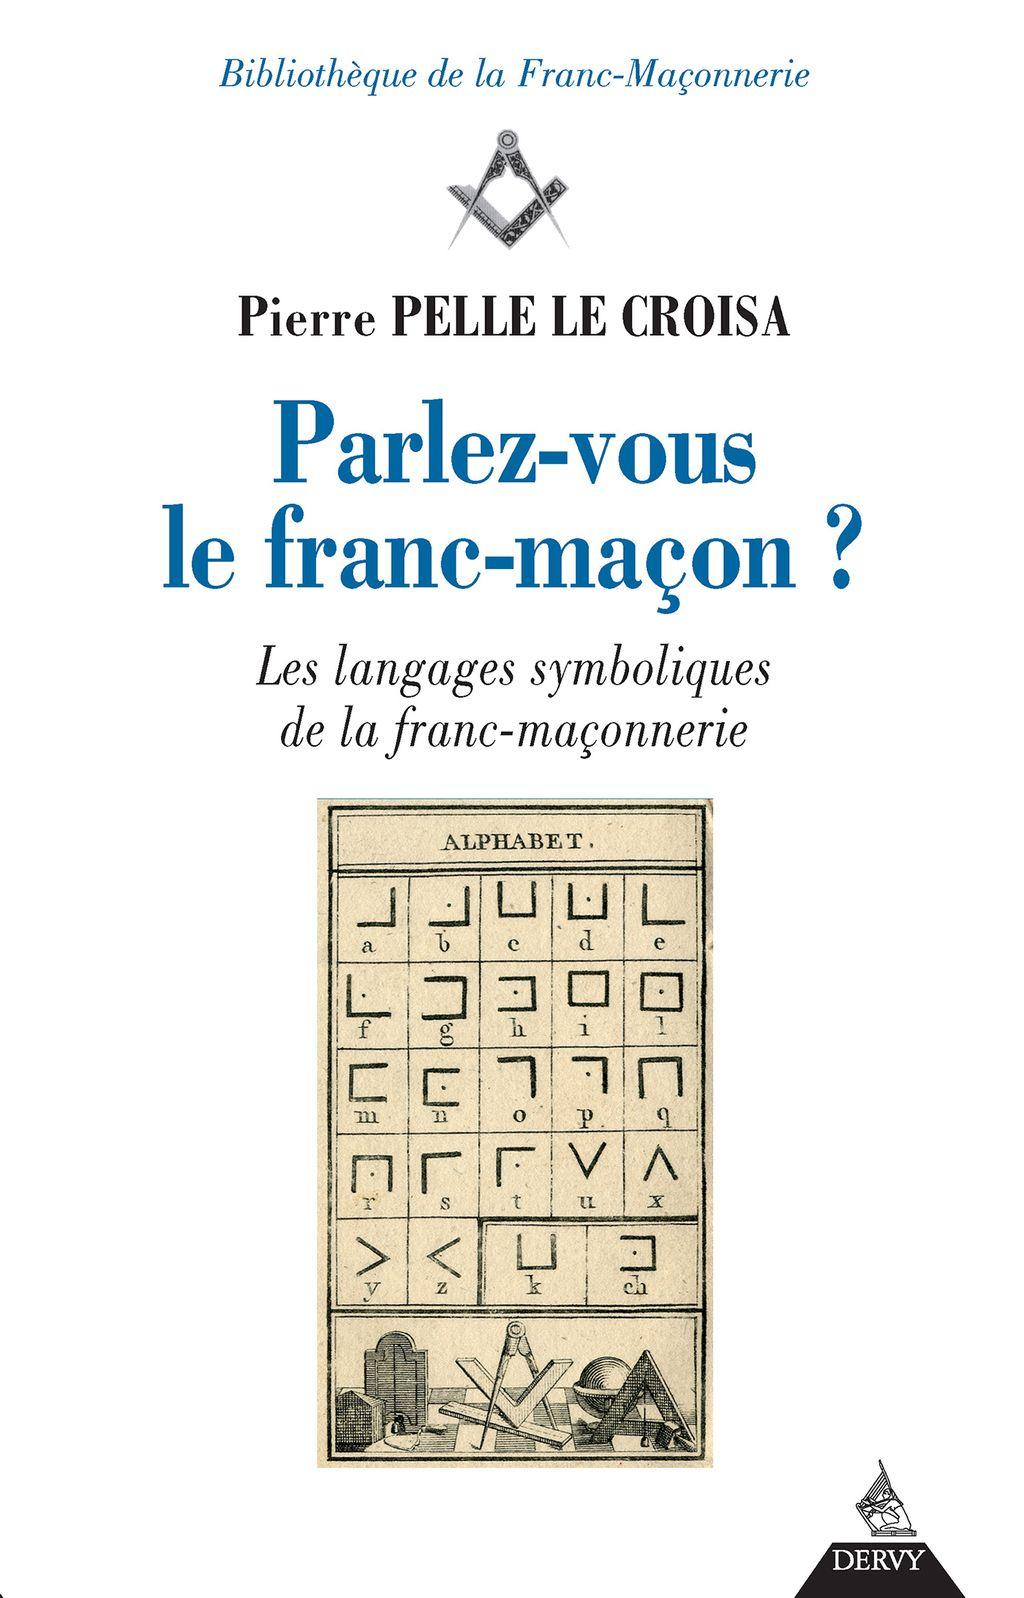 Parlez Vous Le Franc Macon Ebook Ebook Macon Pierre